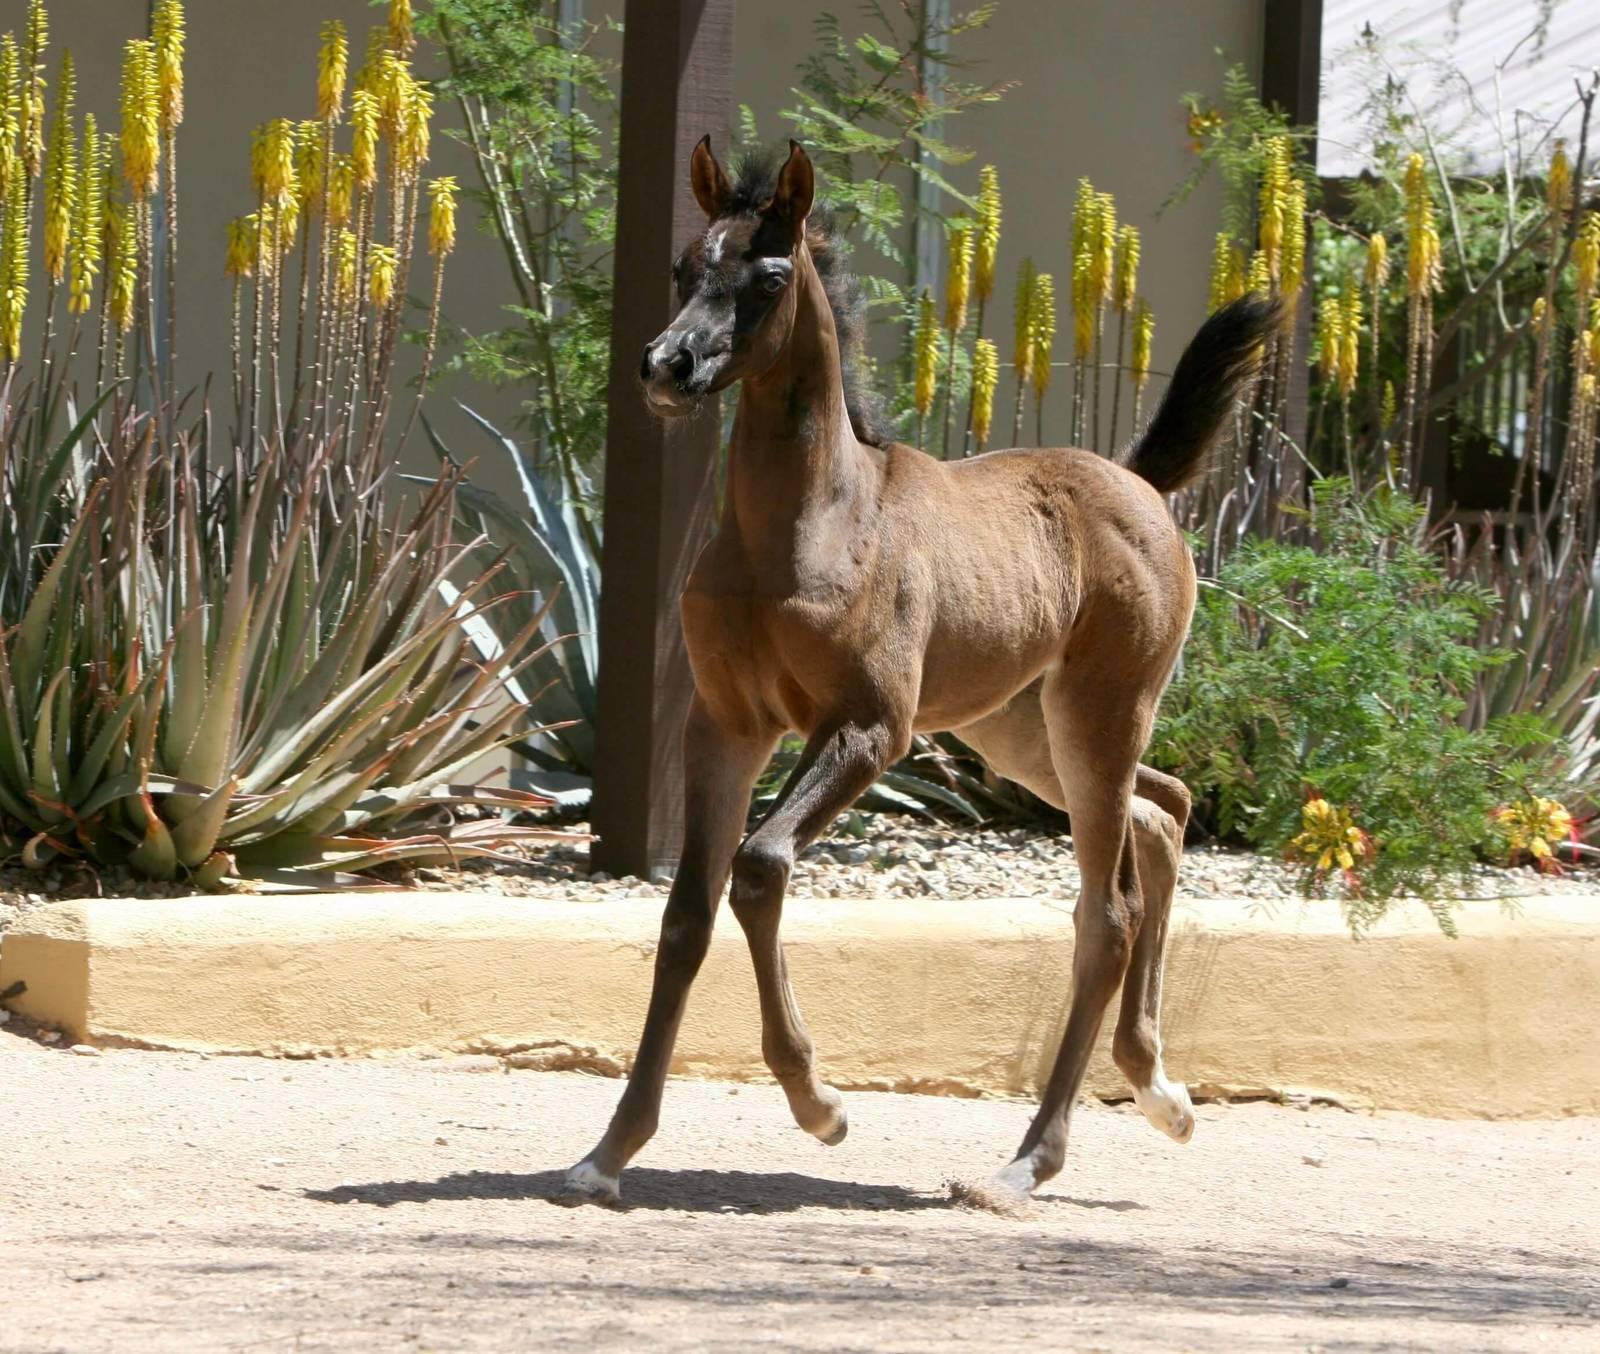 Azpin Brilliance - Black SE filly - Age 4 weeks